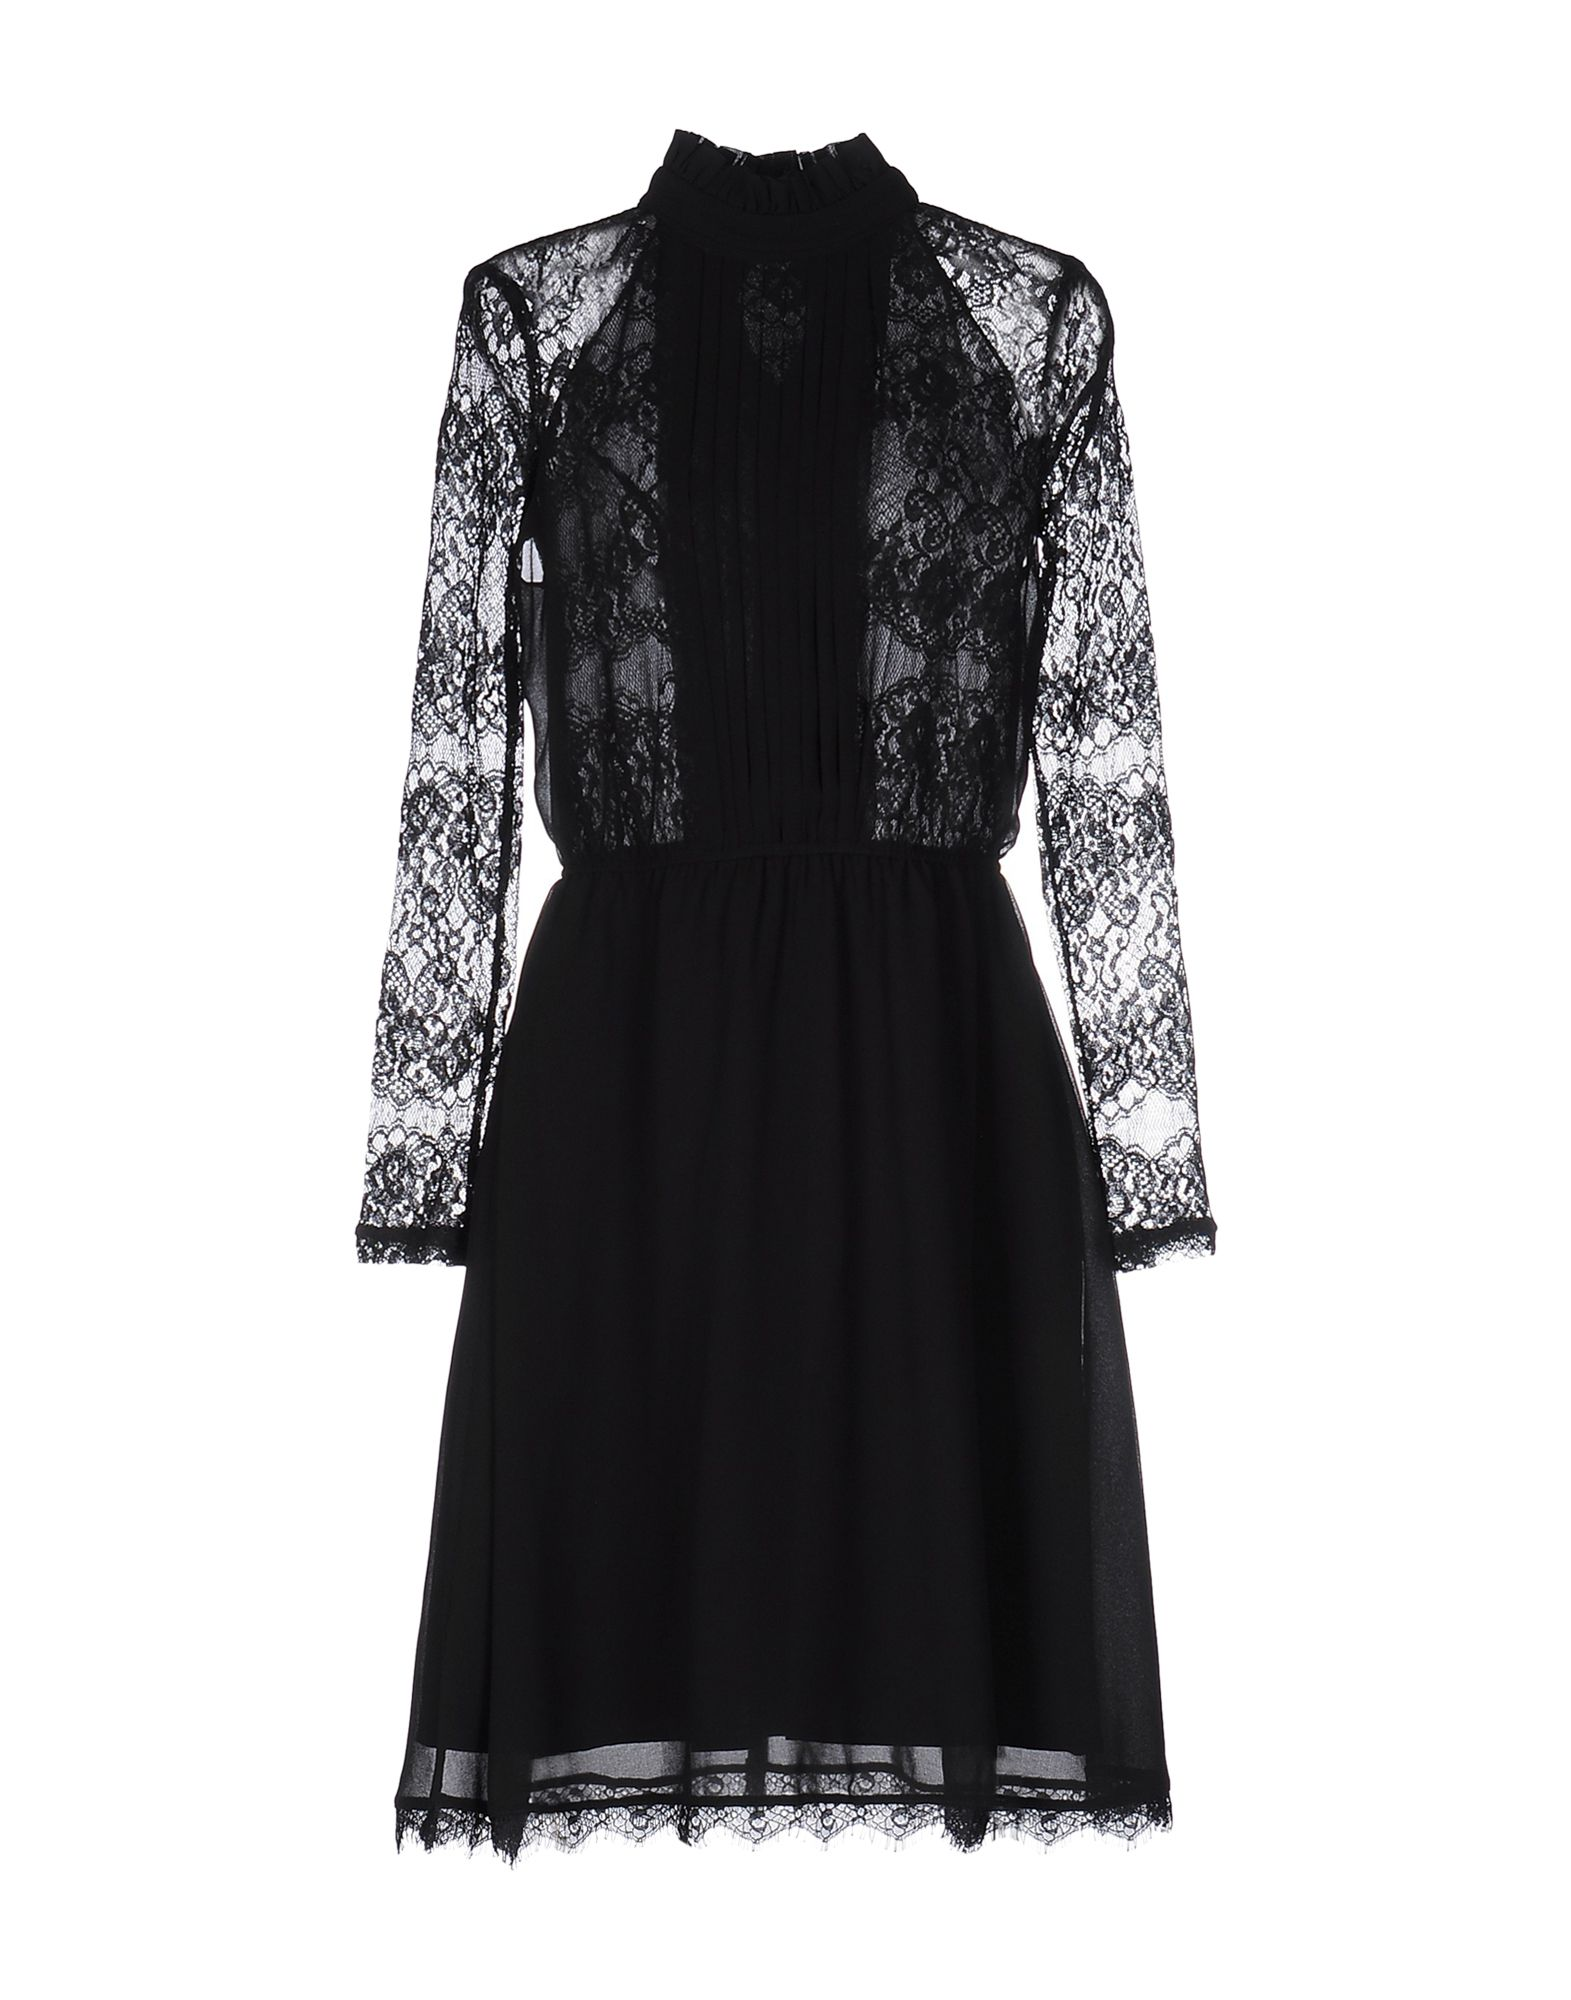 BLUGIRL BLUMARINE Короткое платье фото